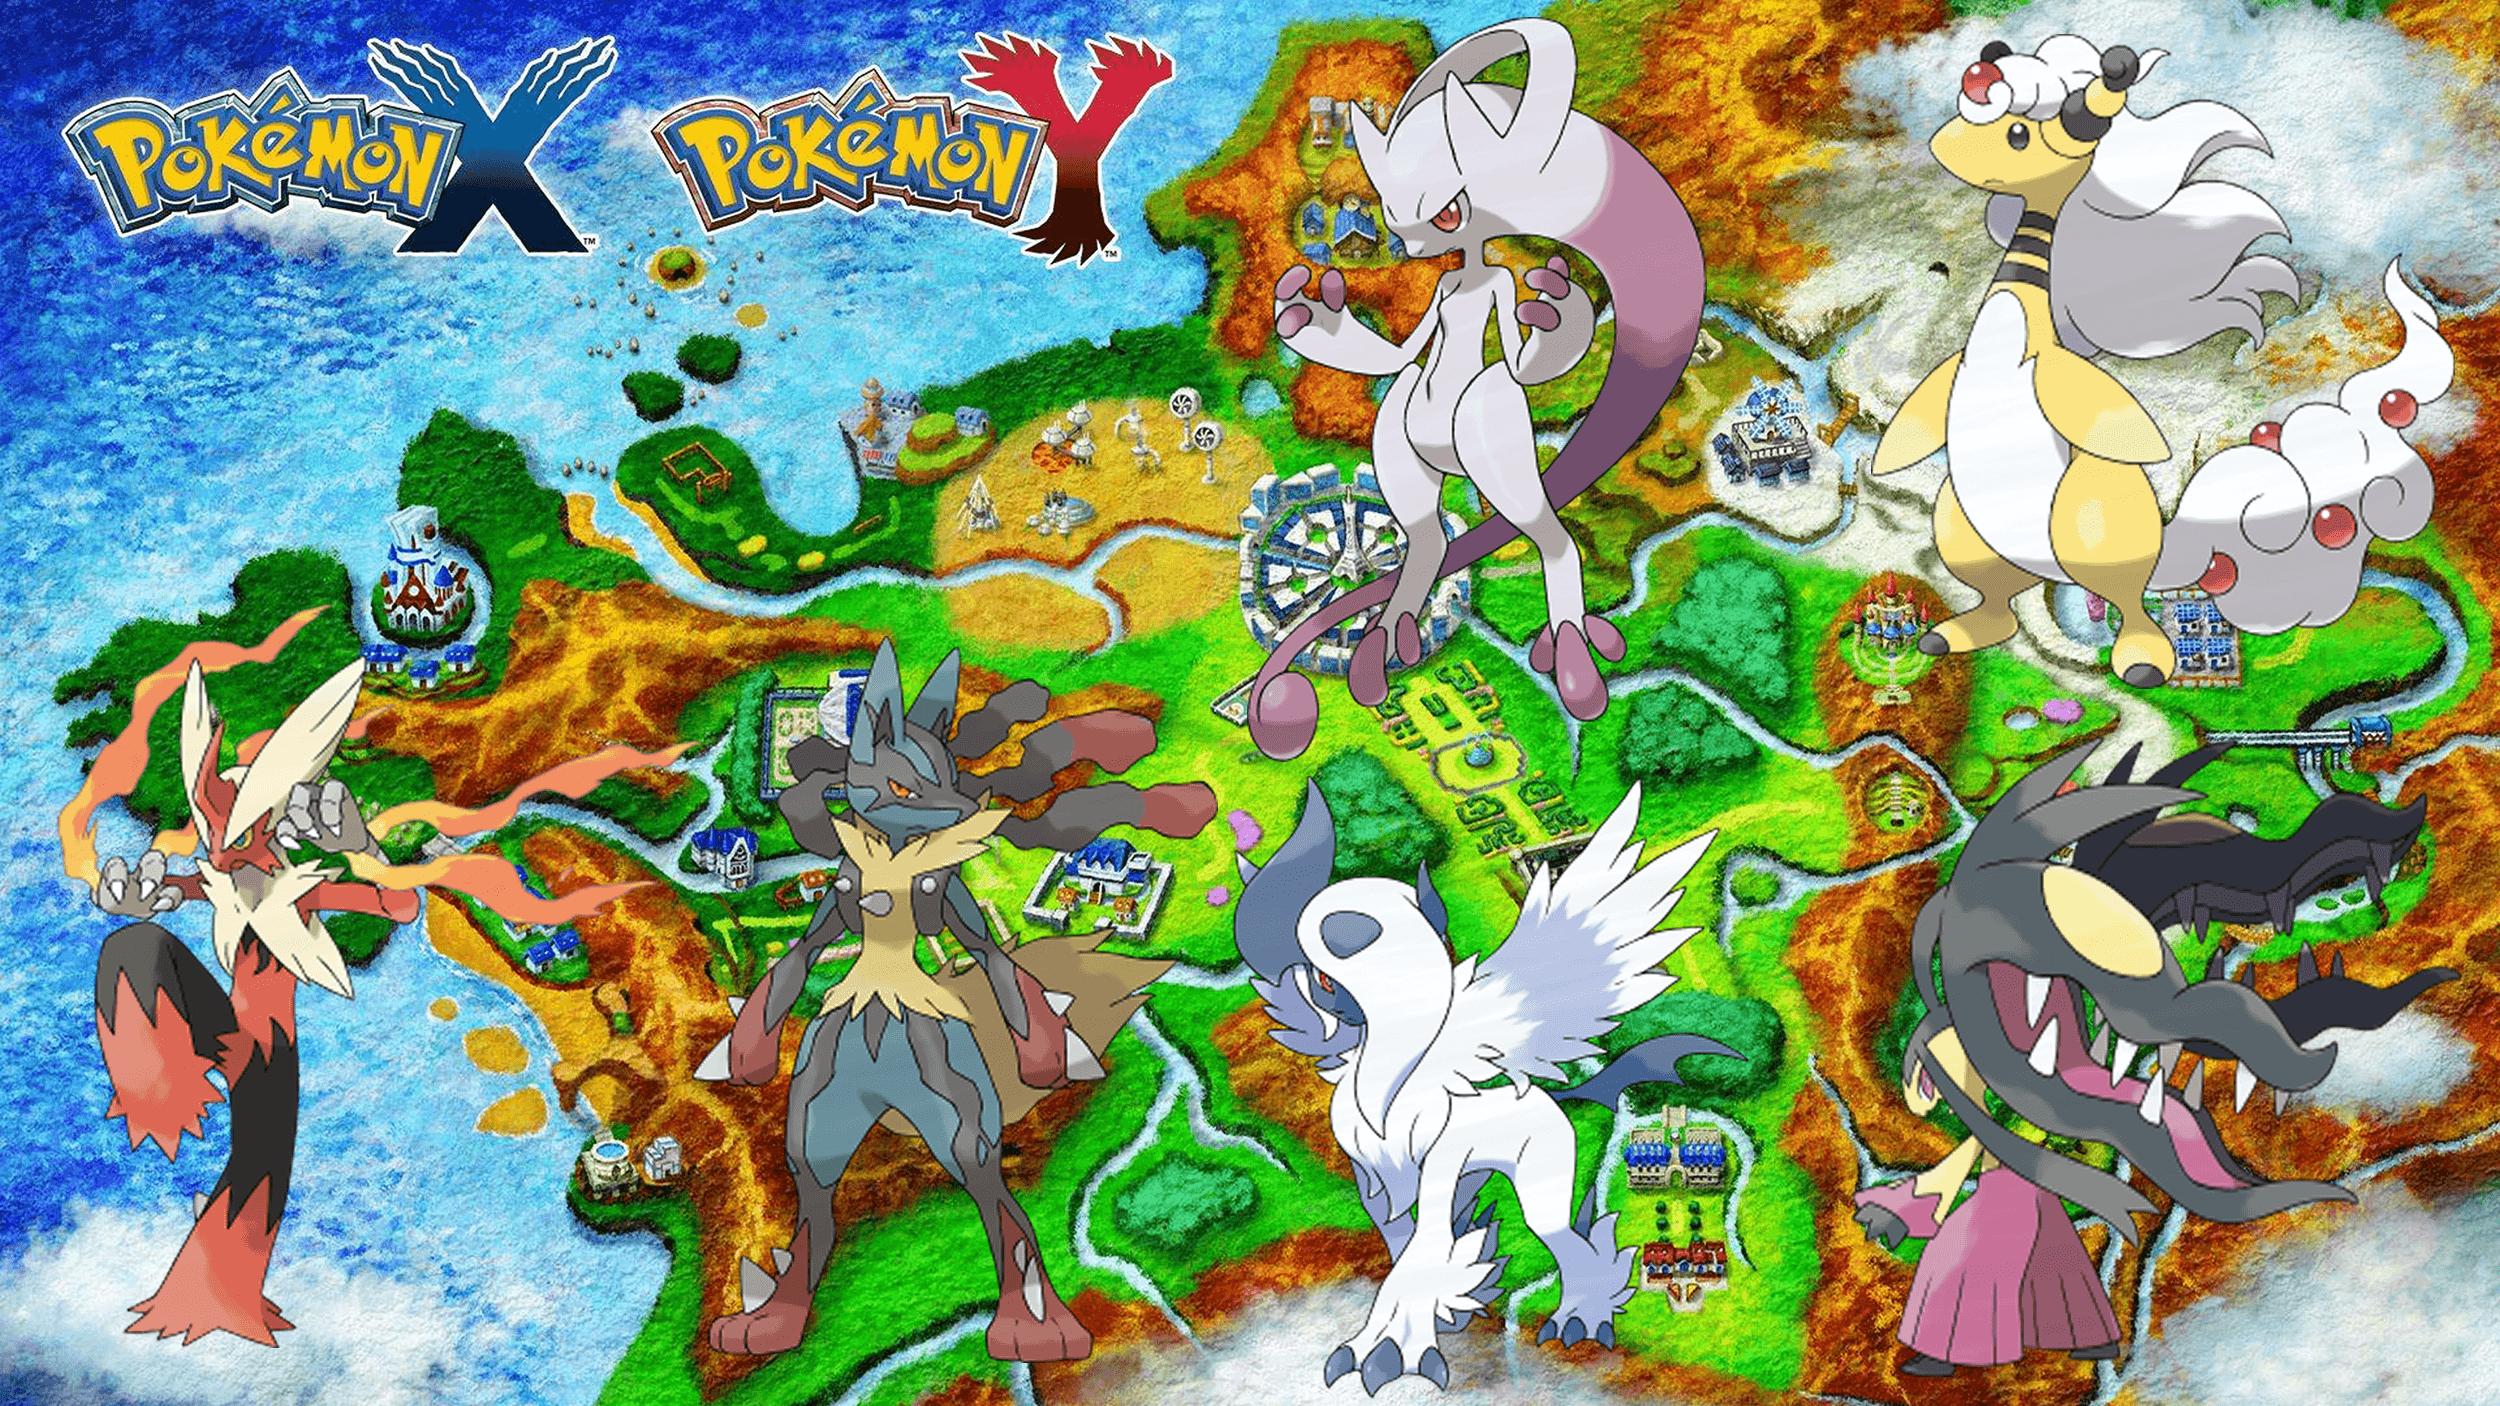 Pok mon mega evolution wallpapers wallpaper cave - Pokemon xy mega pokemon ...